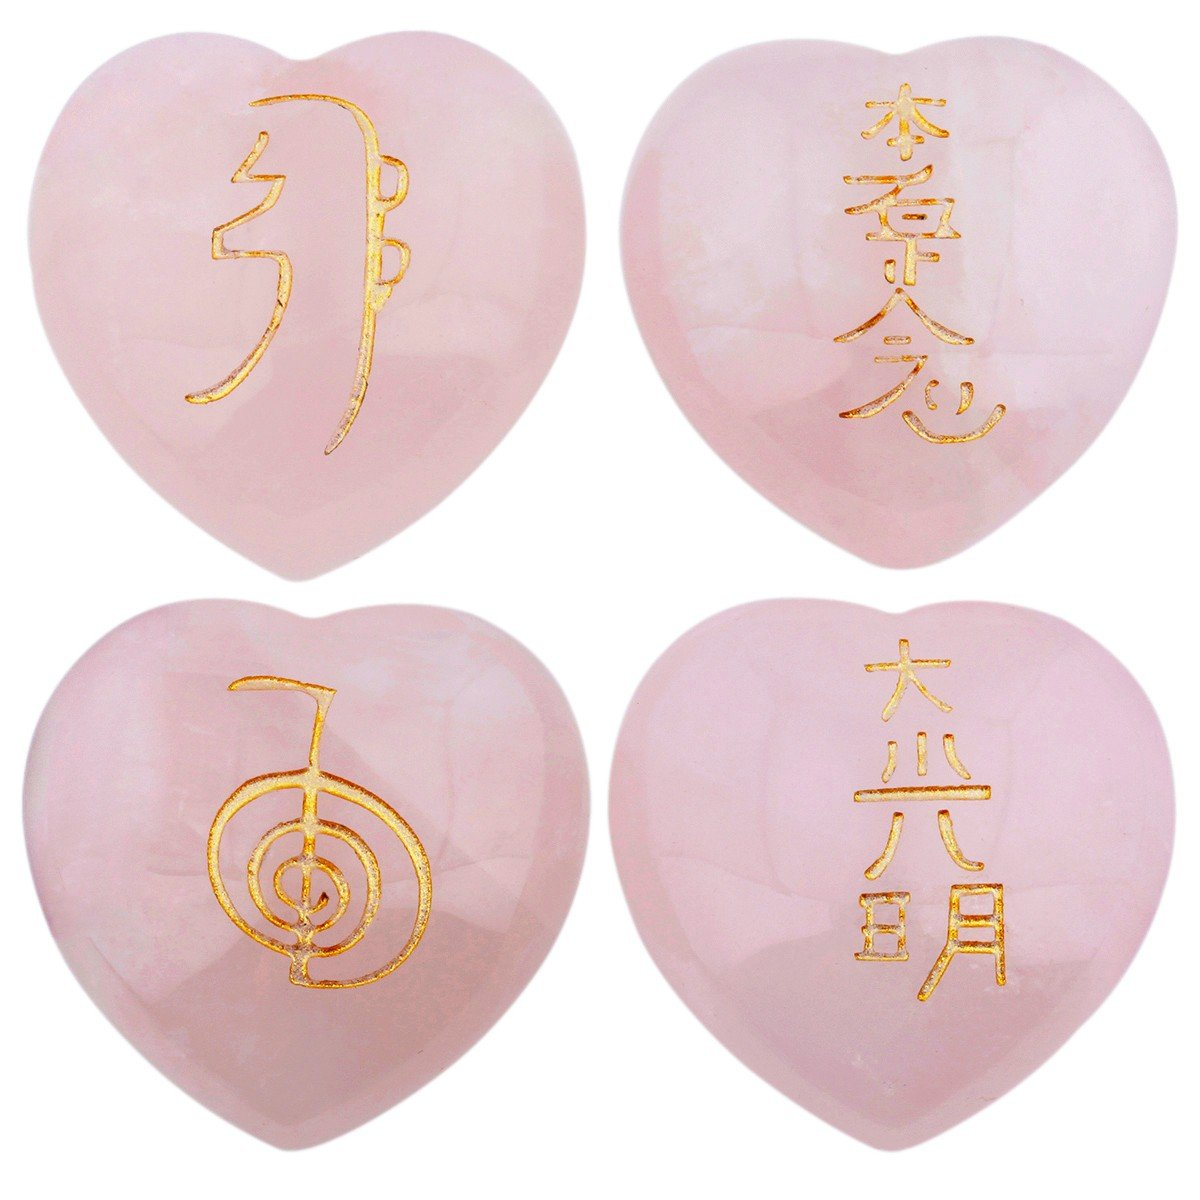 rockcloud Healing Crystal 4pcs Rose Quartz Heart Love Stones Hand Carved Worry Stones Palm Pocket Stone Reiki Balancing